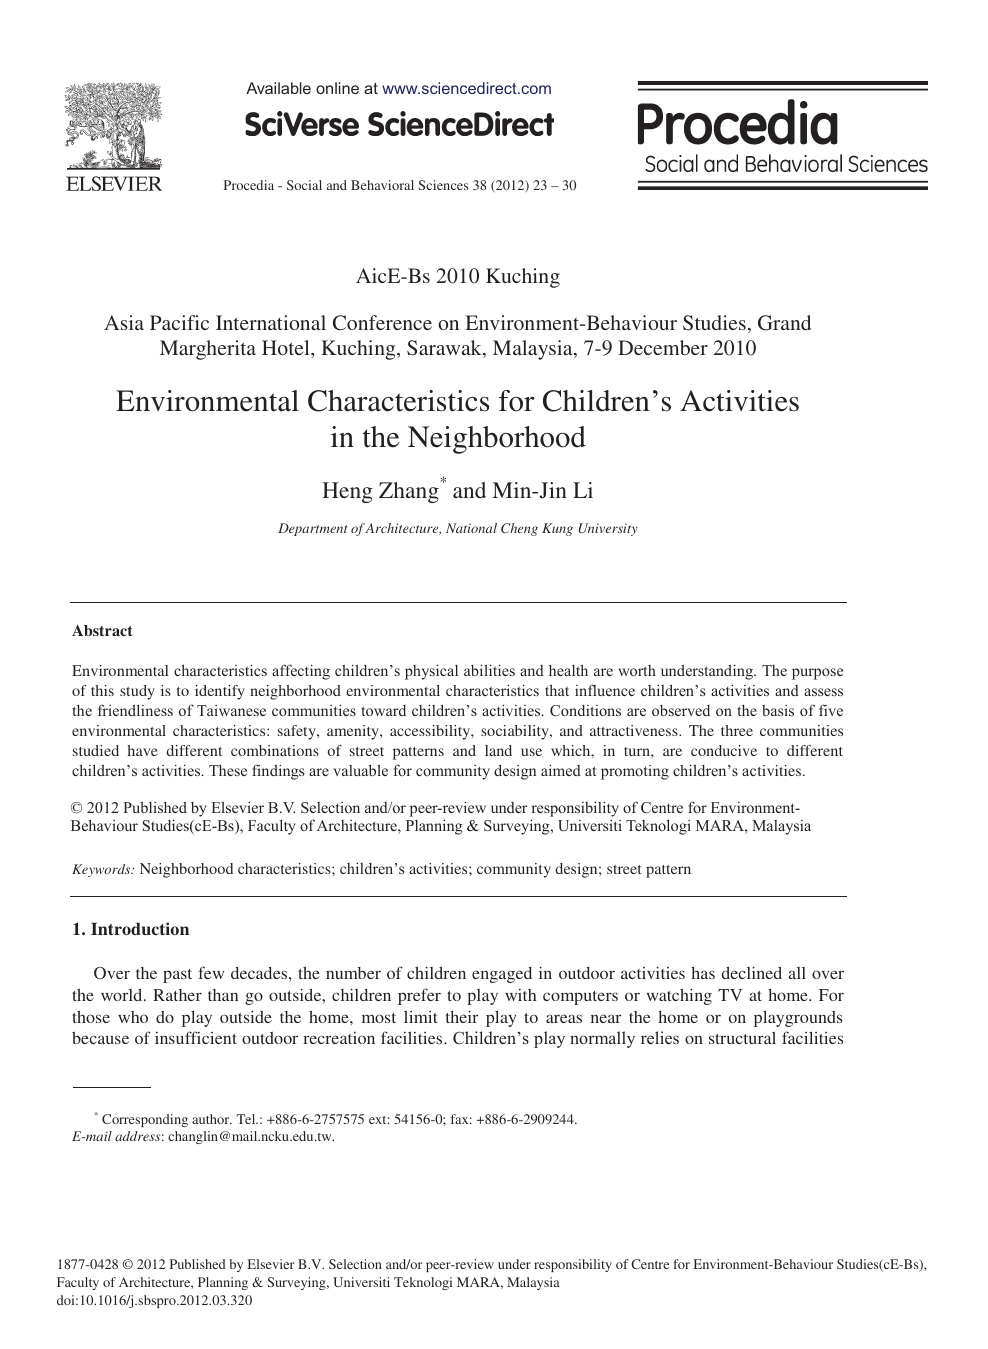 Environmental Characteristics for Children's Activities in